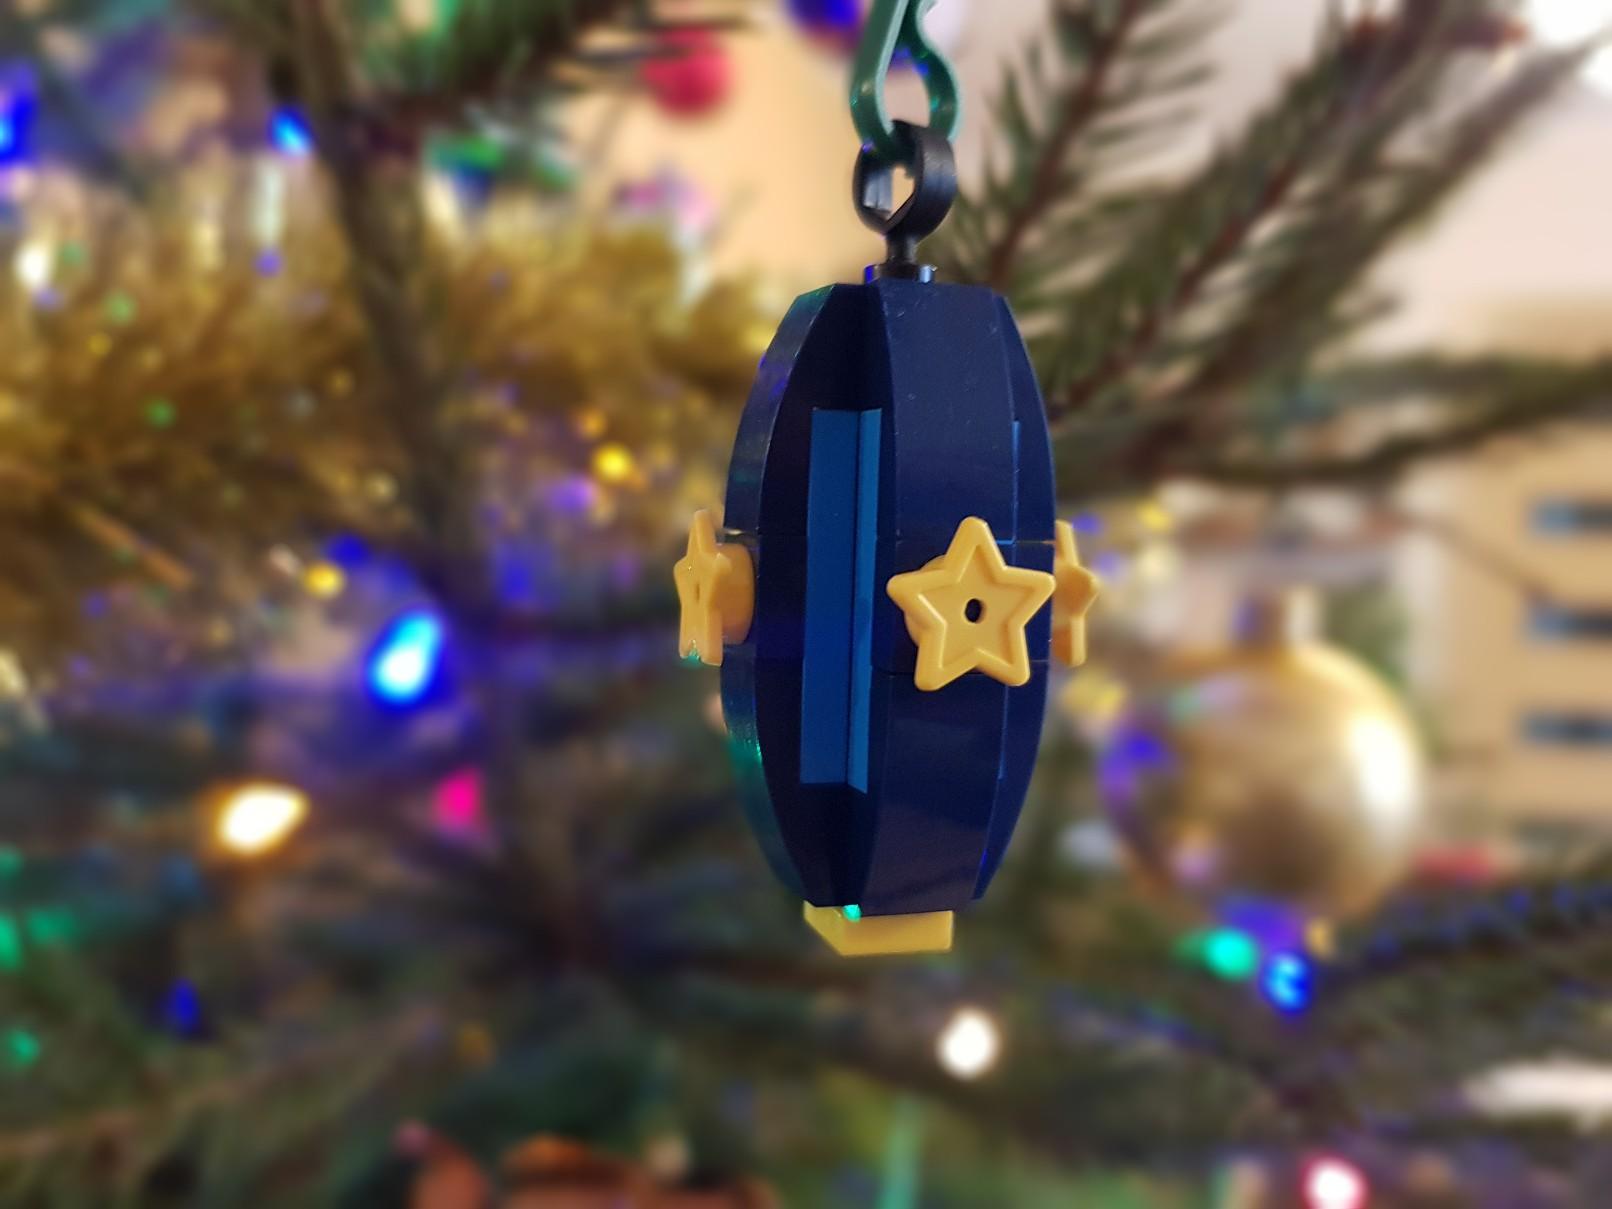 lego moc christmas baubles ornament blue